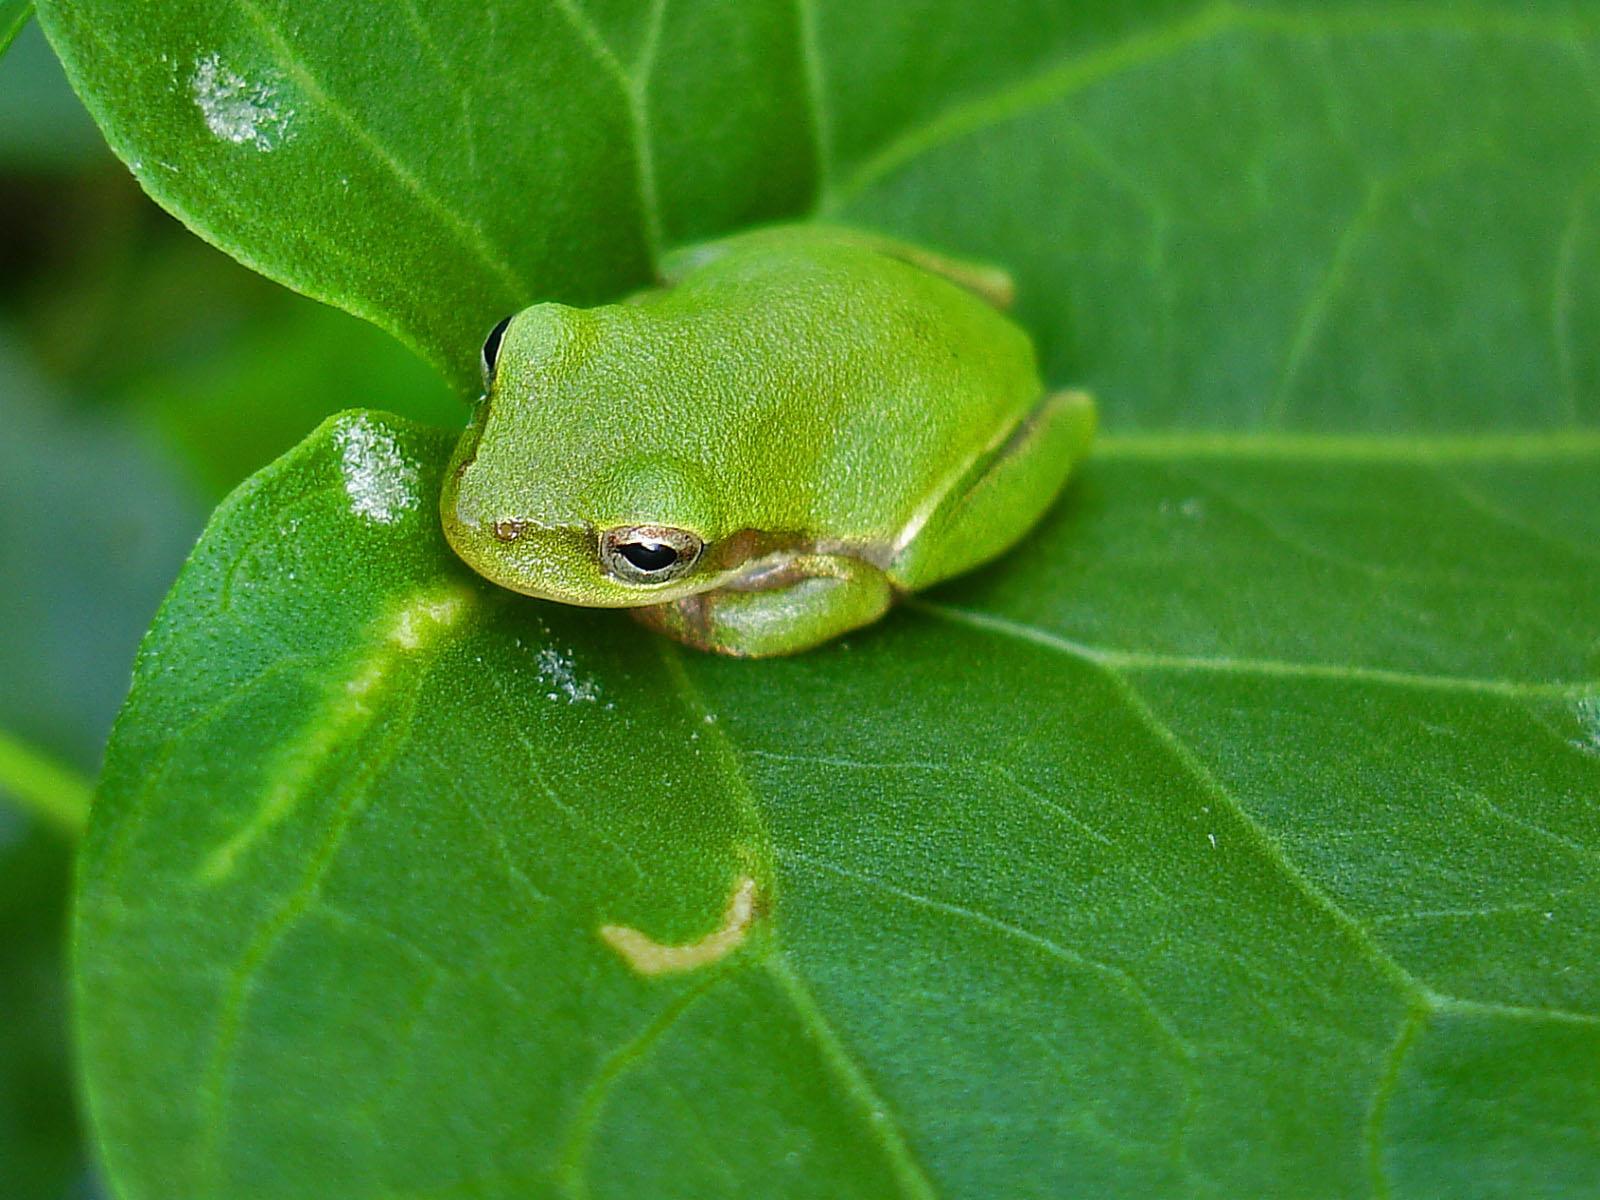 nature wallpaper backgrounds frog wallpaper